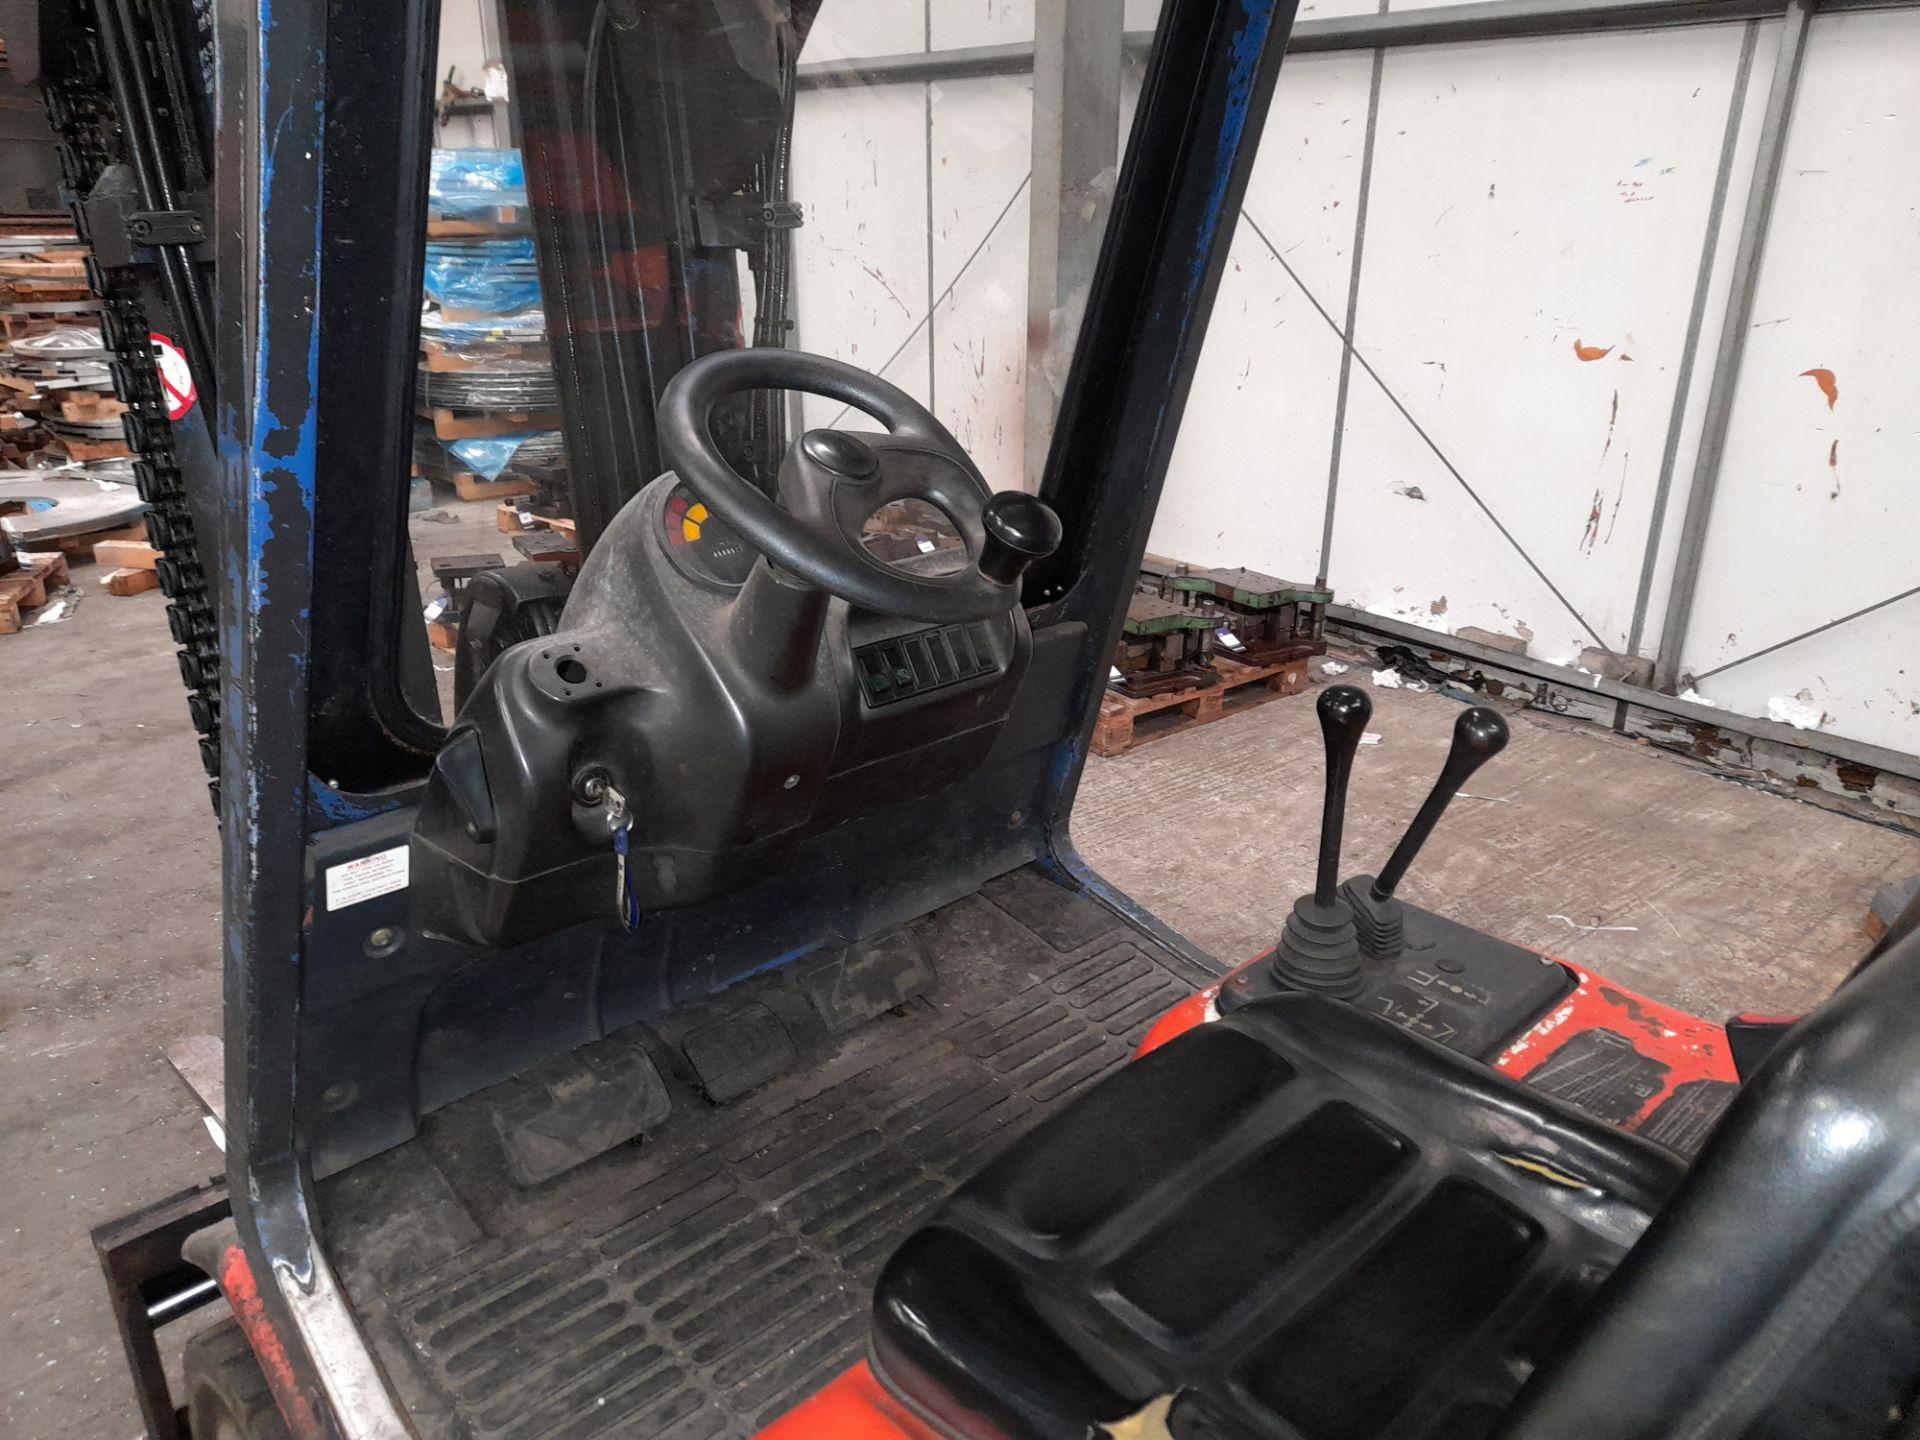 Linde H25T-02 LPG Forklift Truck, 2500kg Capacity, Triple Mast, Side Shift, Lift Height 3925mm, - Image 8 of 9